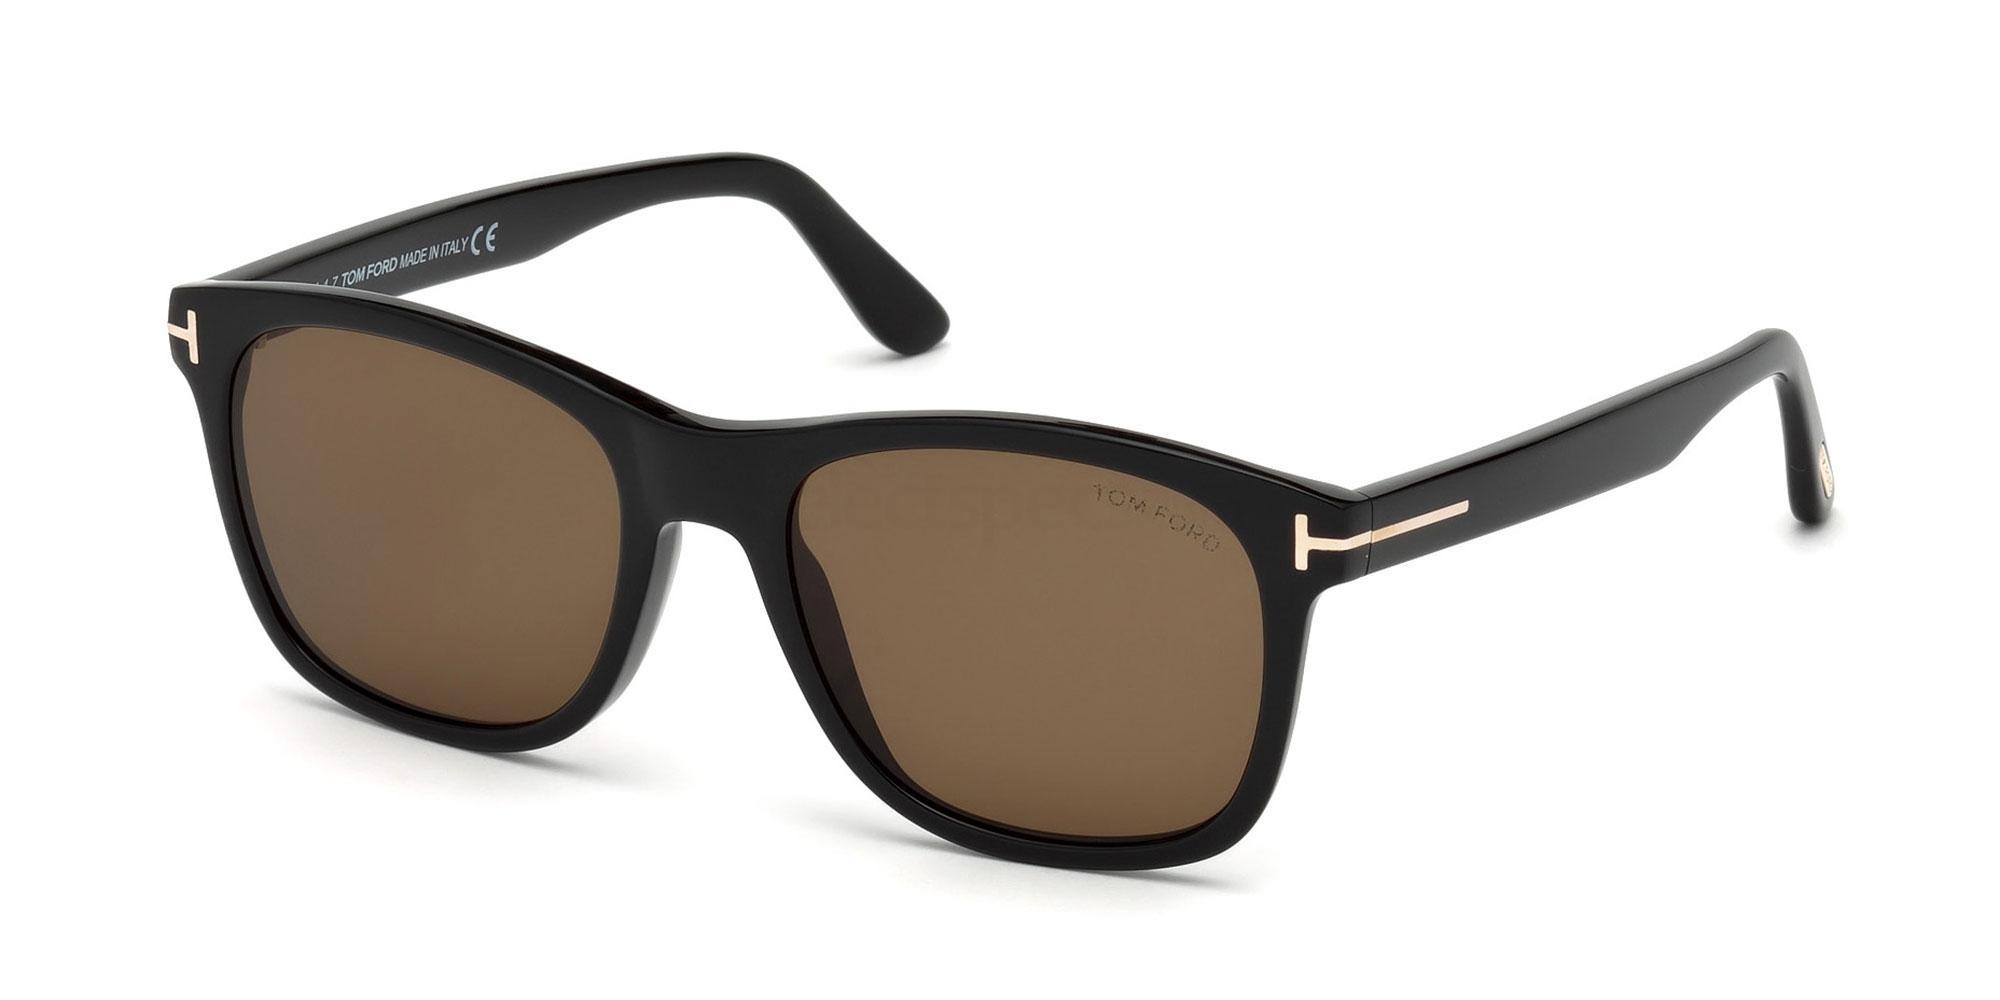 01J FT0595 Sunglasses, Tom Ford